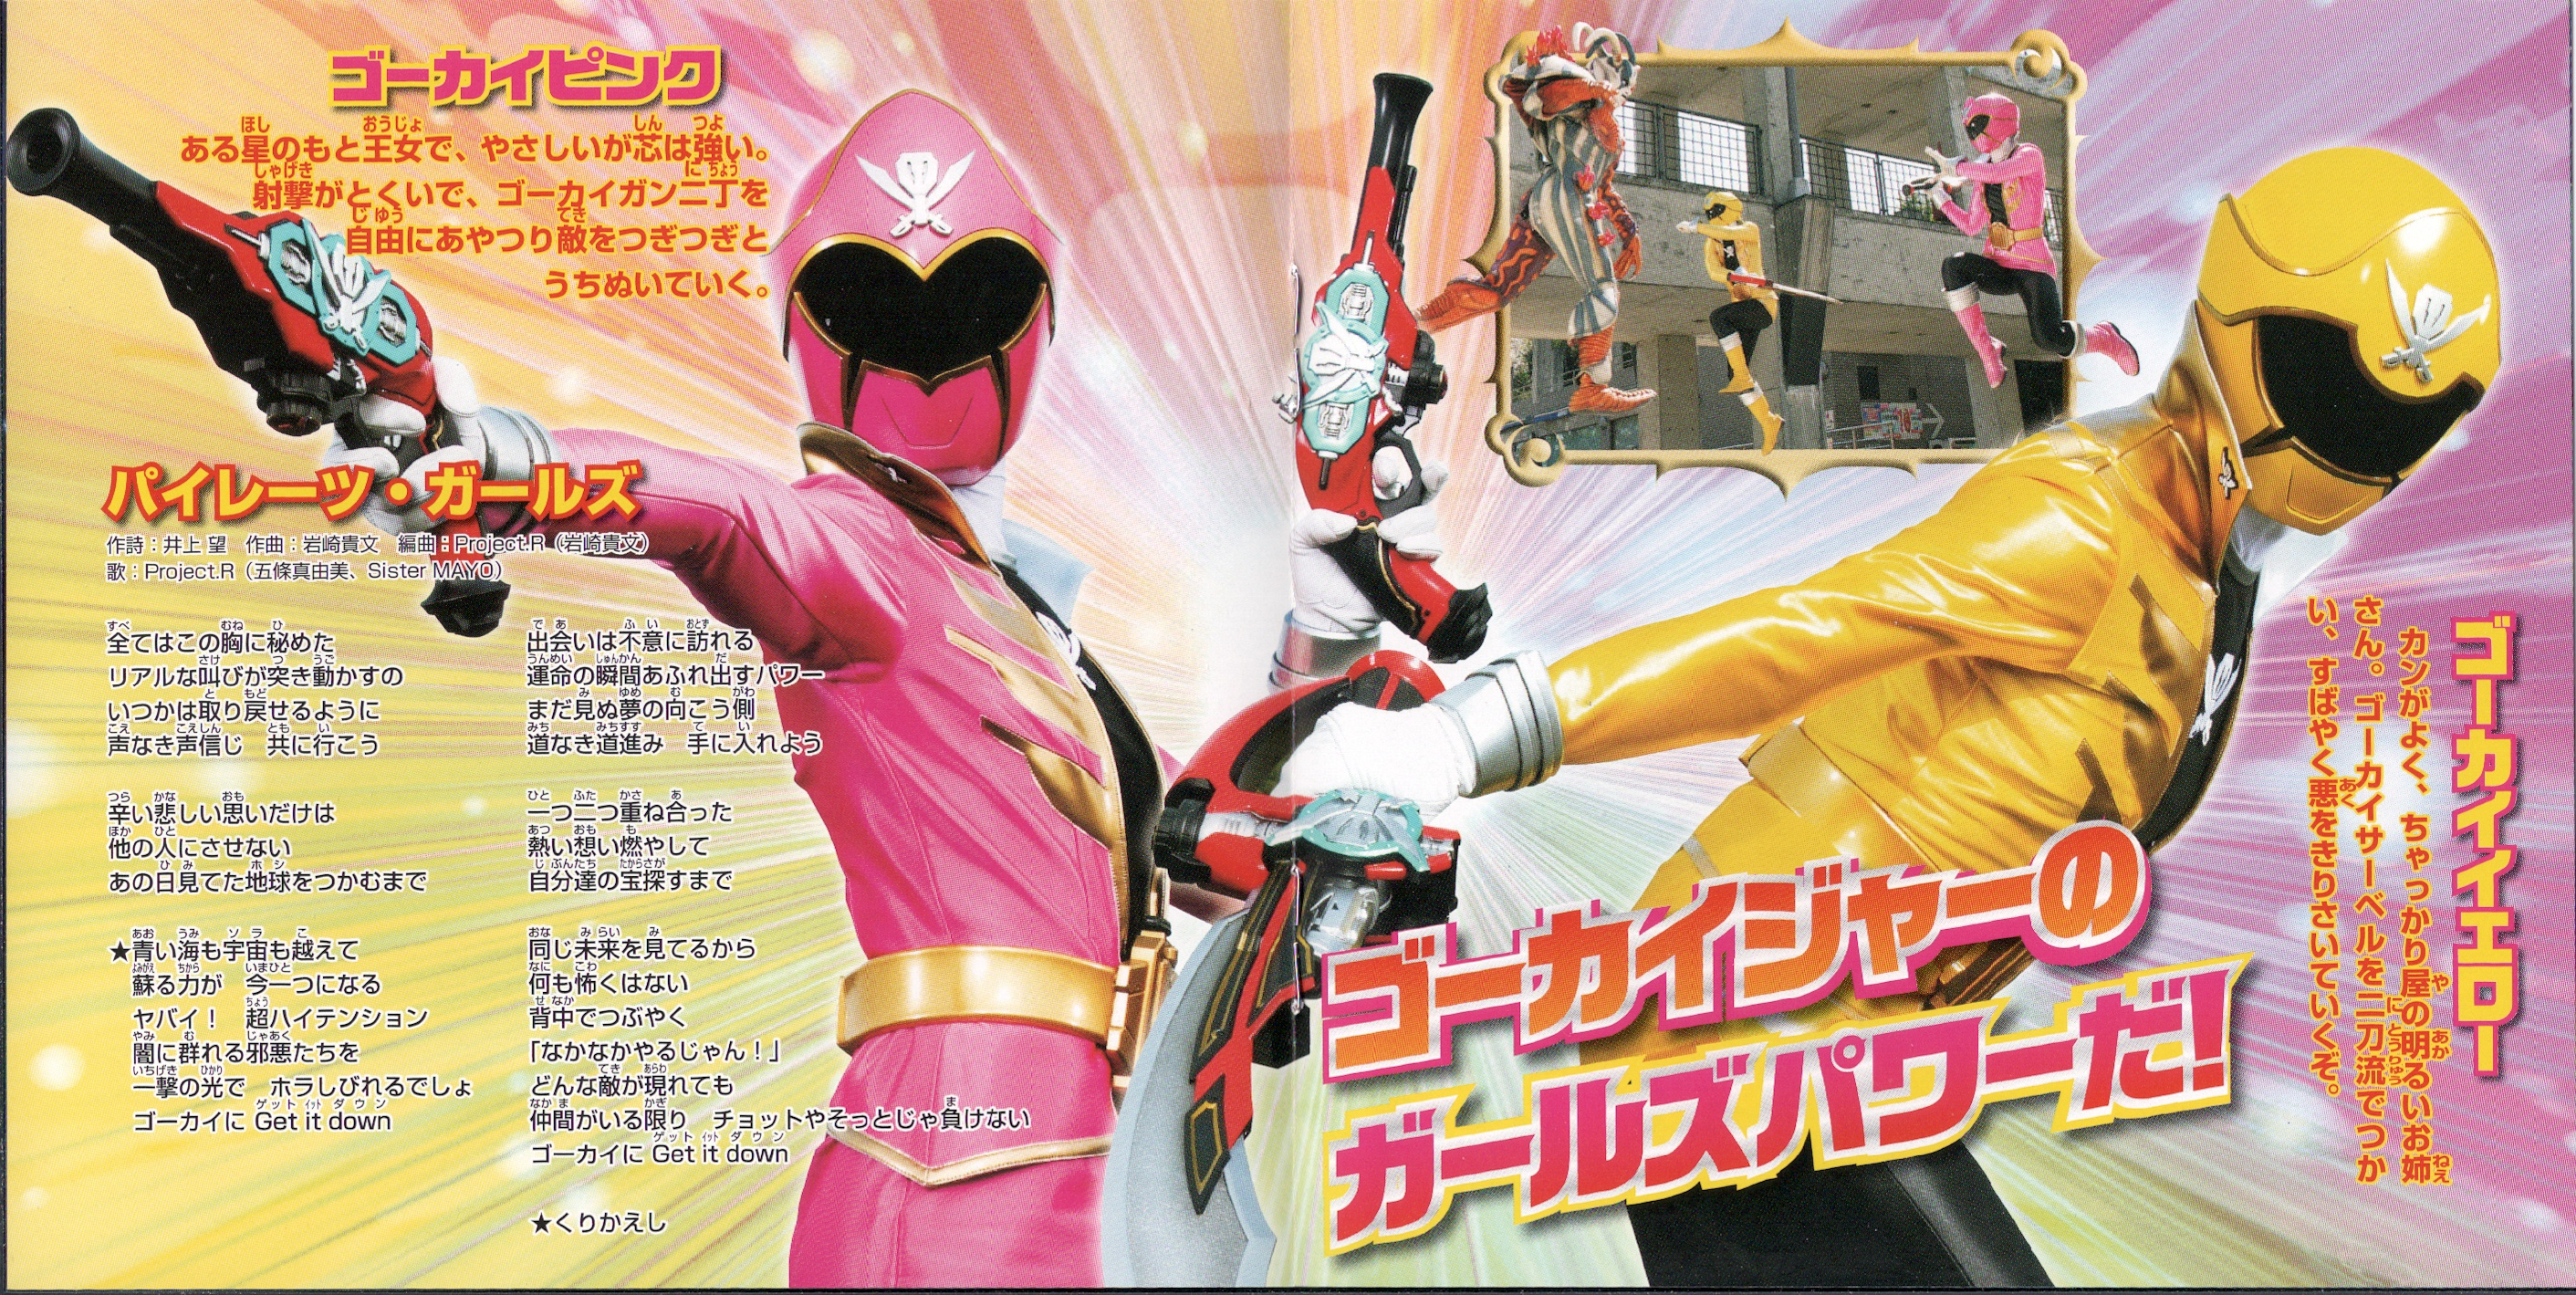 JSONGS] Kaizoku Sentai Gokaiger Mini Album 3 - ddl tokusatsu-fansub